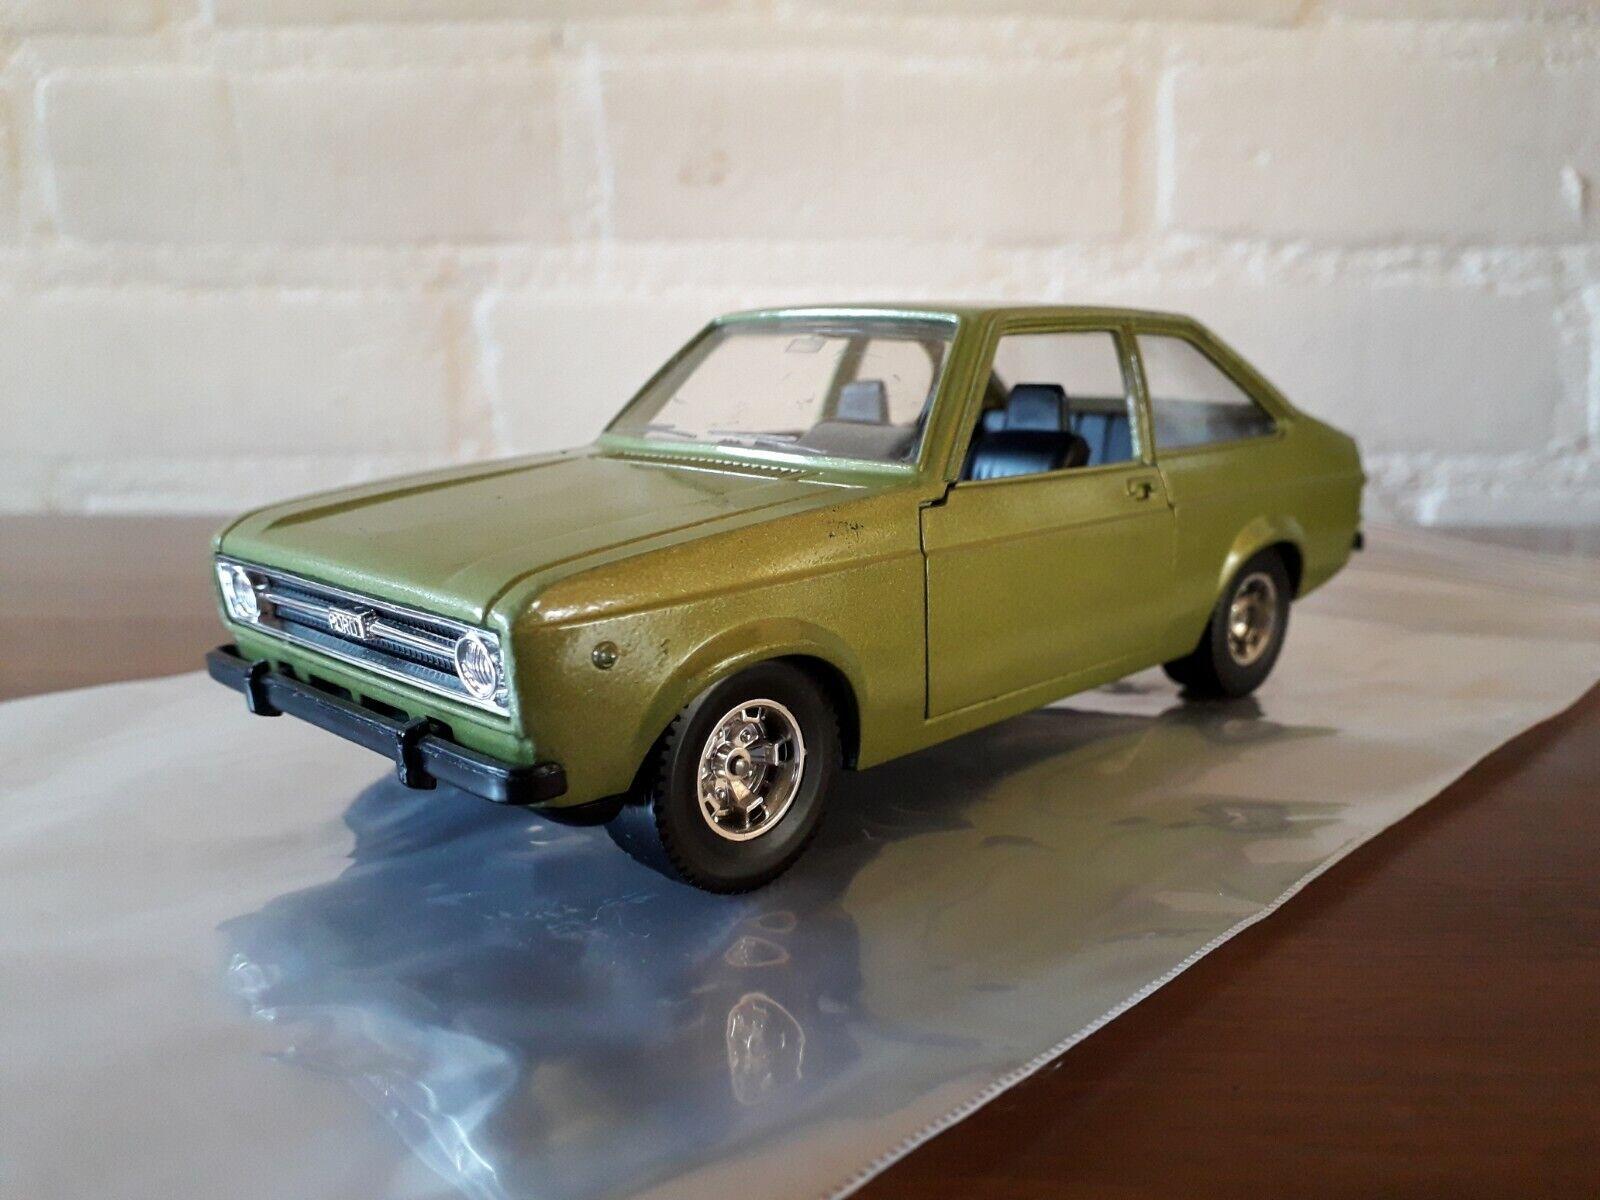 Bburago 1 24 No 0146 Ford Escort 1100L MK2 1975-1980 , verde metallic ´Rare´